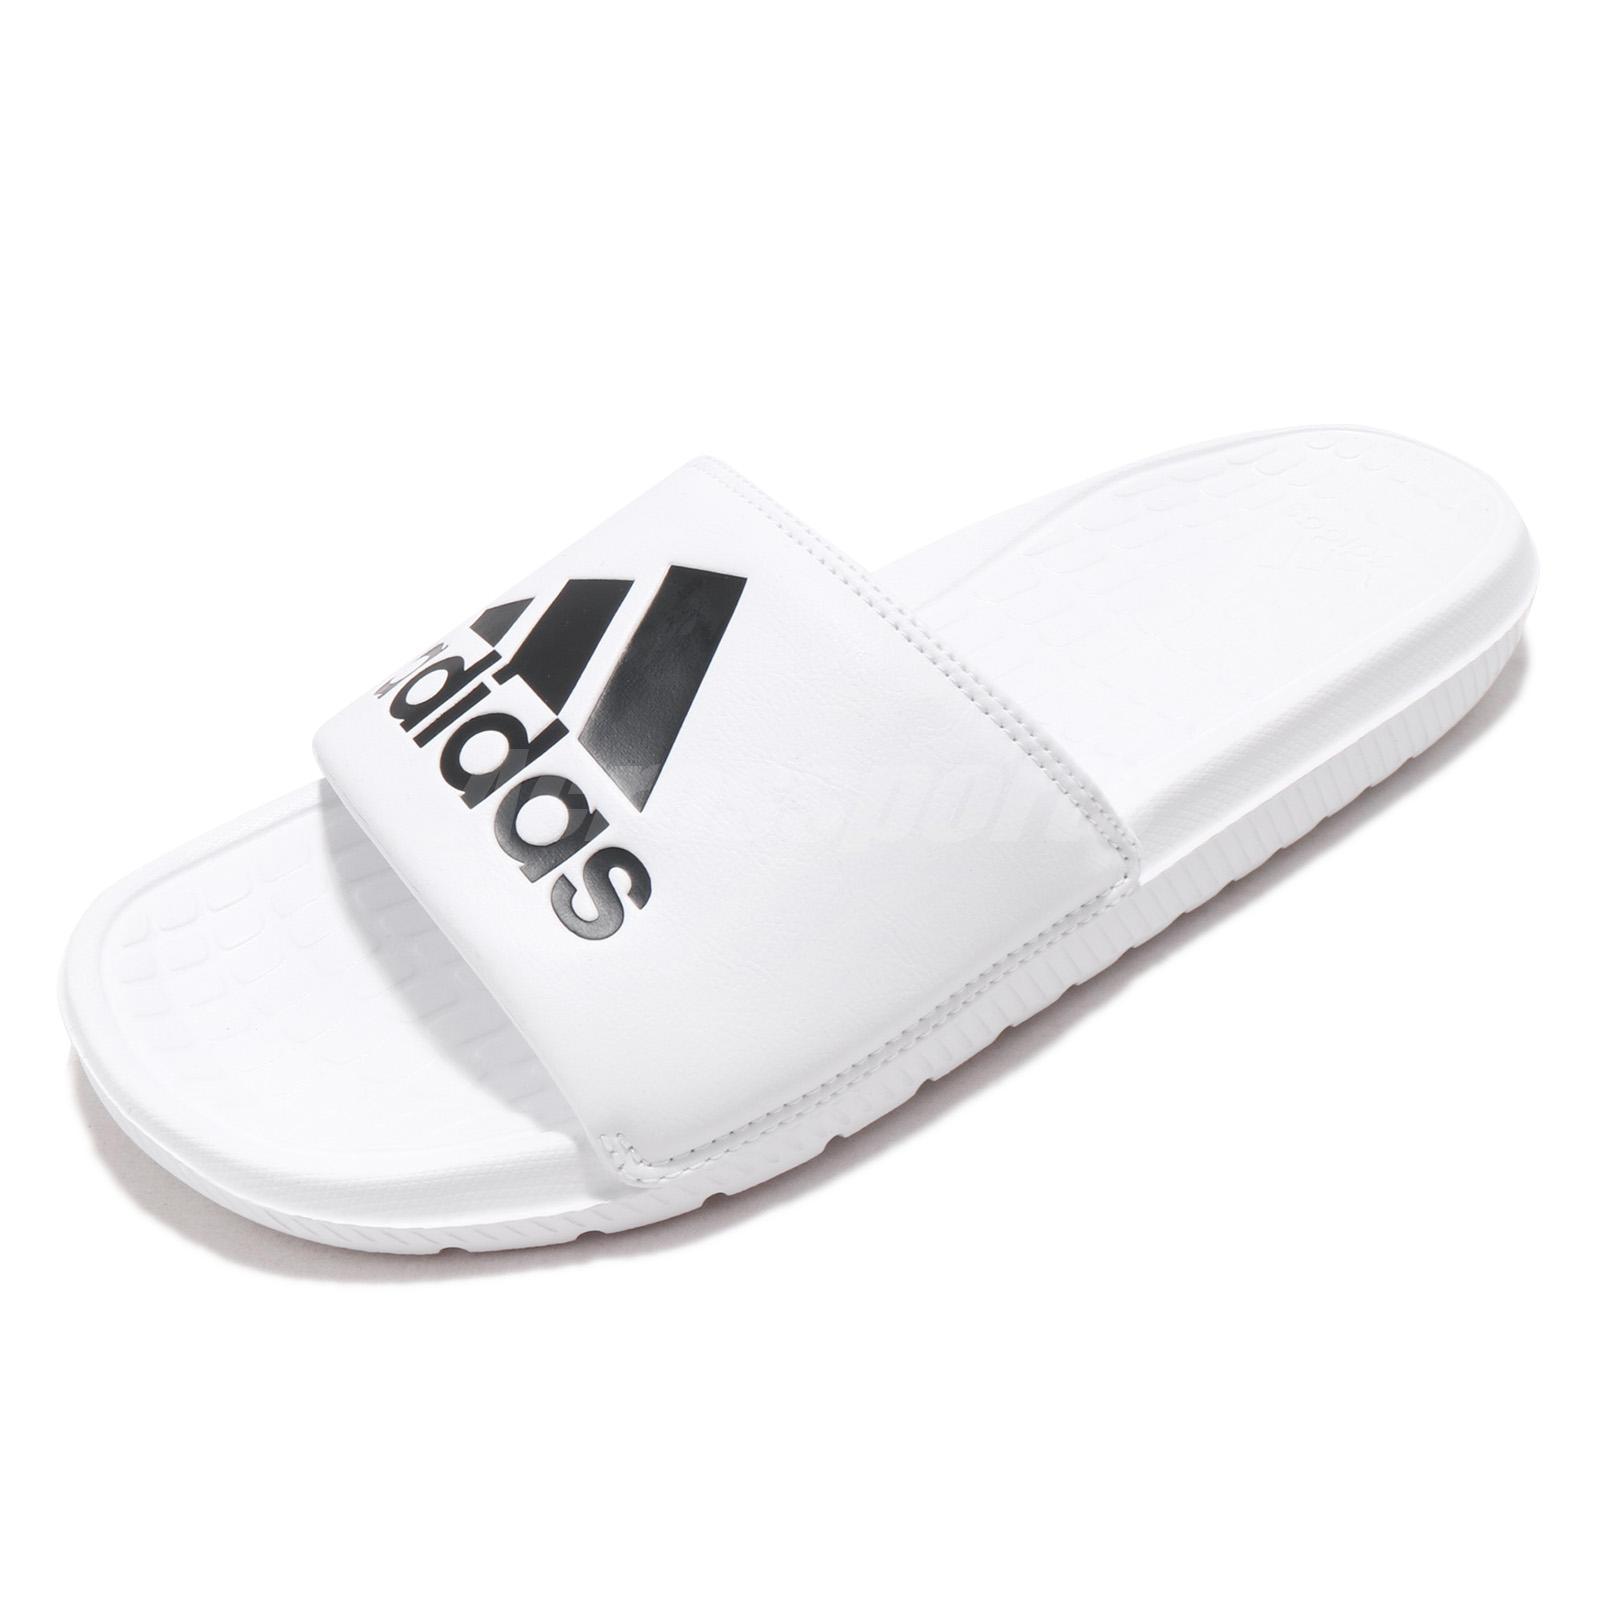 98c3d1730b42 Details about adidas Voloomix Slides Logo White Black Men Sports Sandals  Slippers CP9447